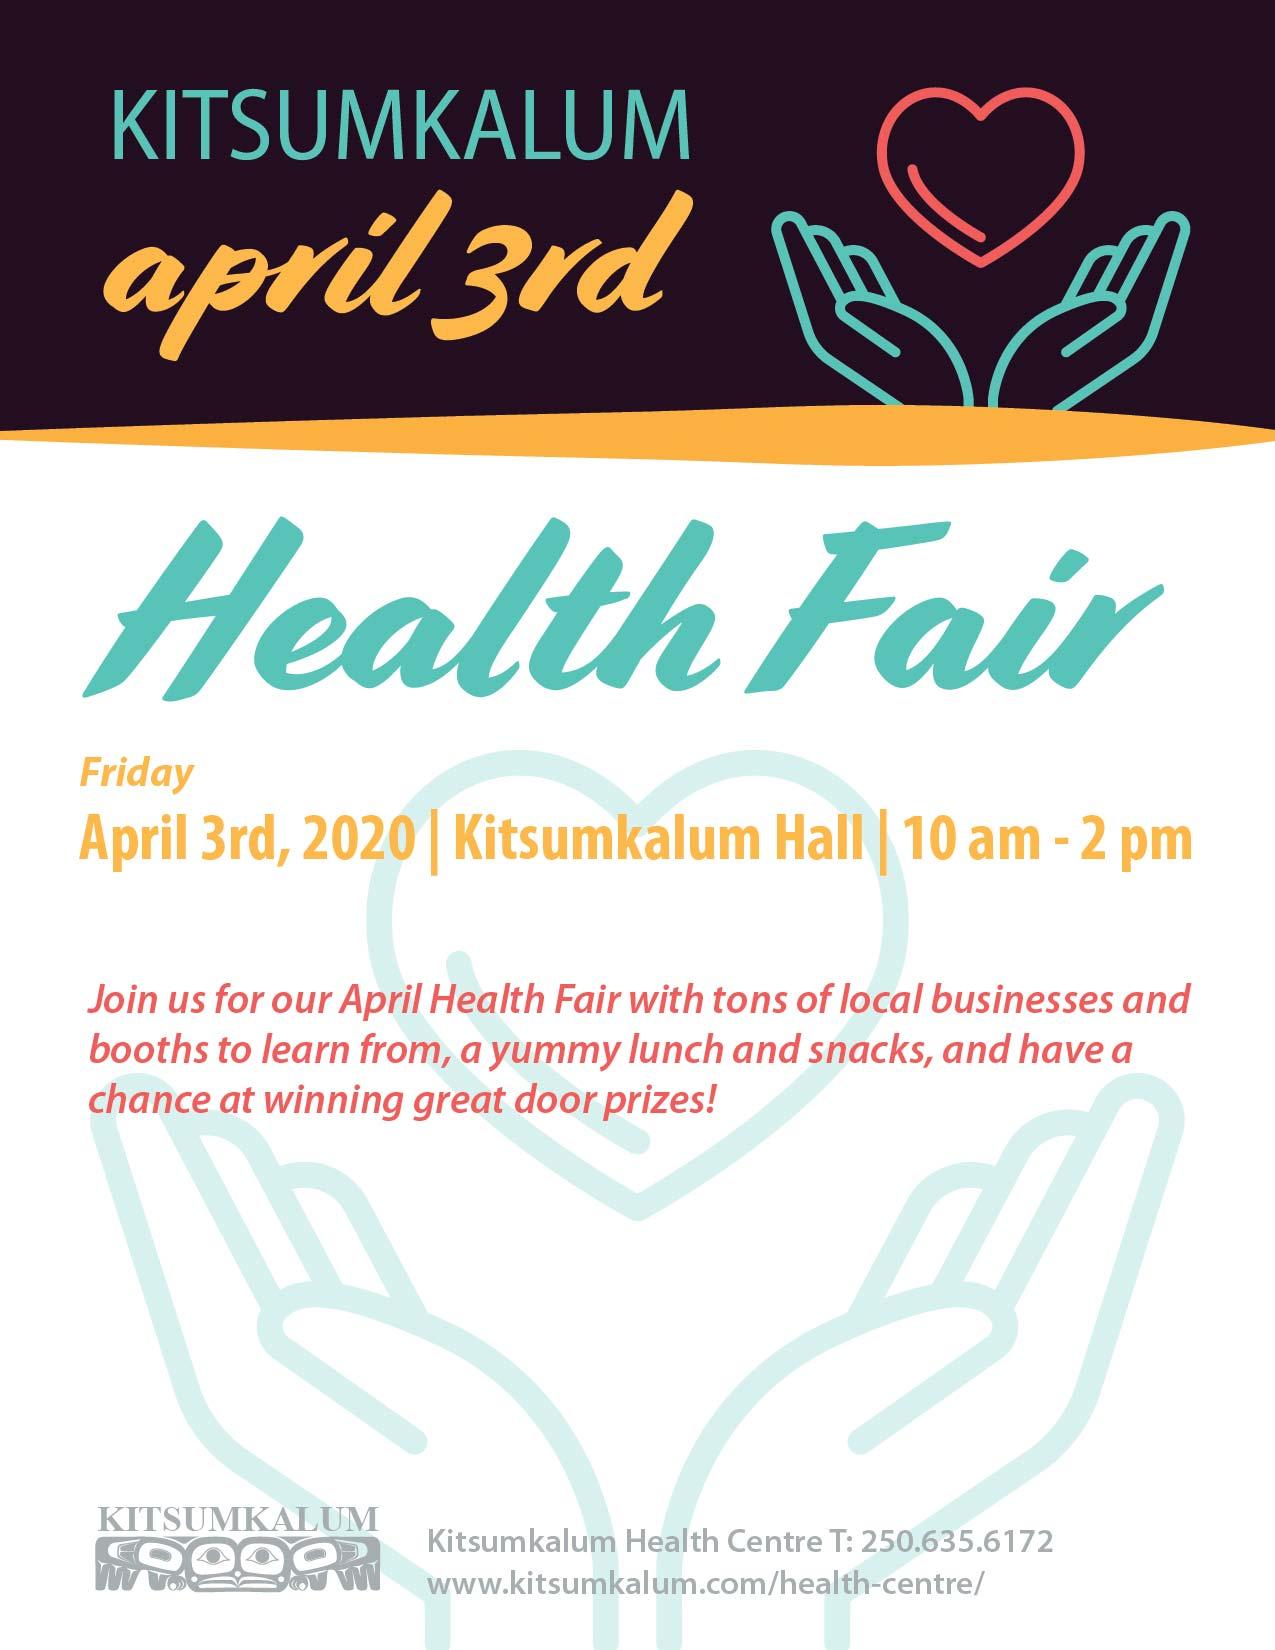 POSTPONED Health Fair at Kitsumkalum Hall April 3rd